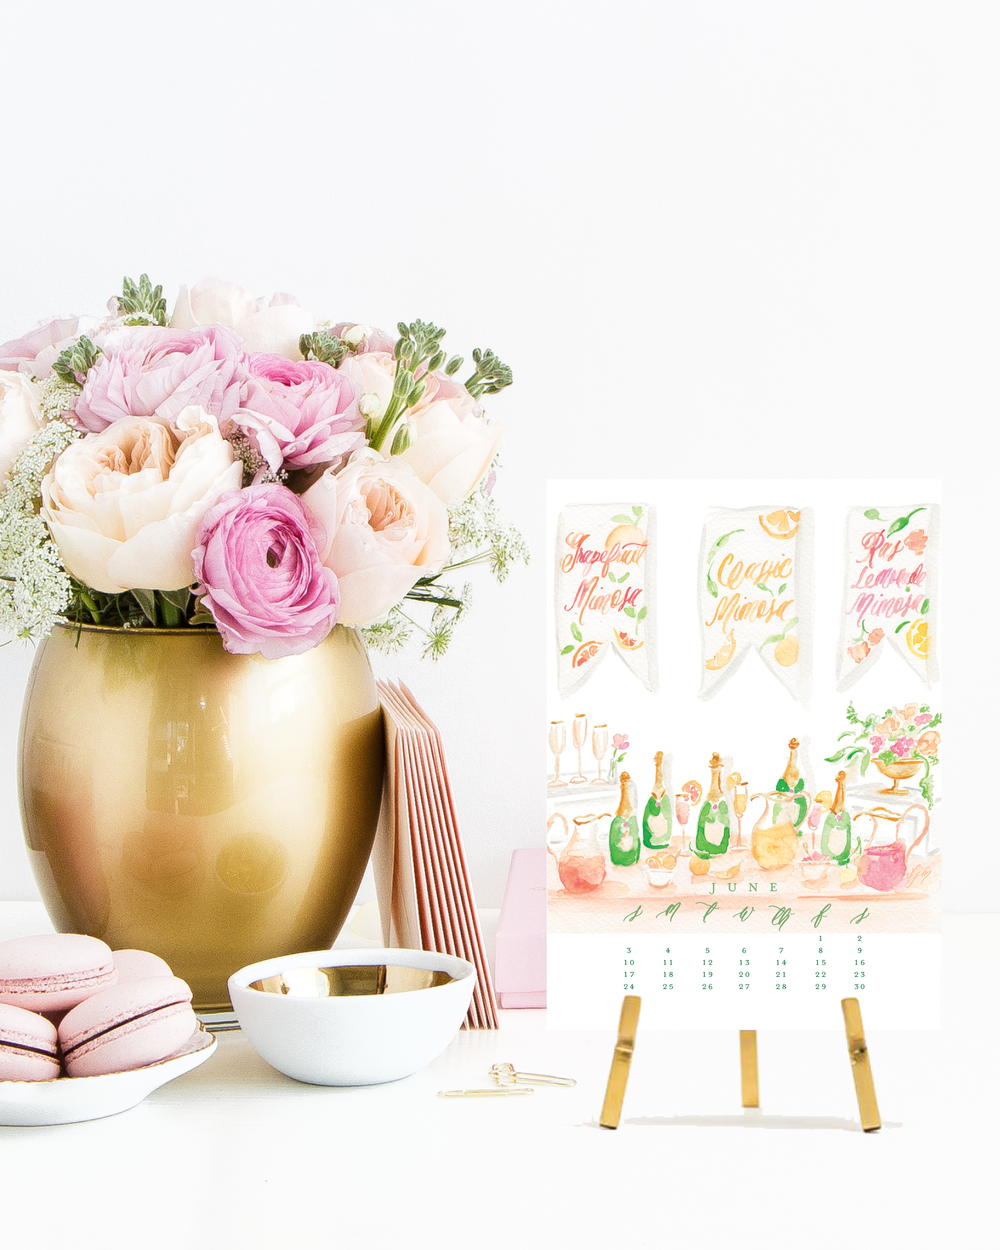 Simply-Jessica-Marie-Holiday-2018-Cocktail-Calendar-_-Brunch-Cocktails-_-Cocktail-Watercolor-Illustration-Desk-Calendar-_-June.png